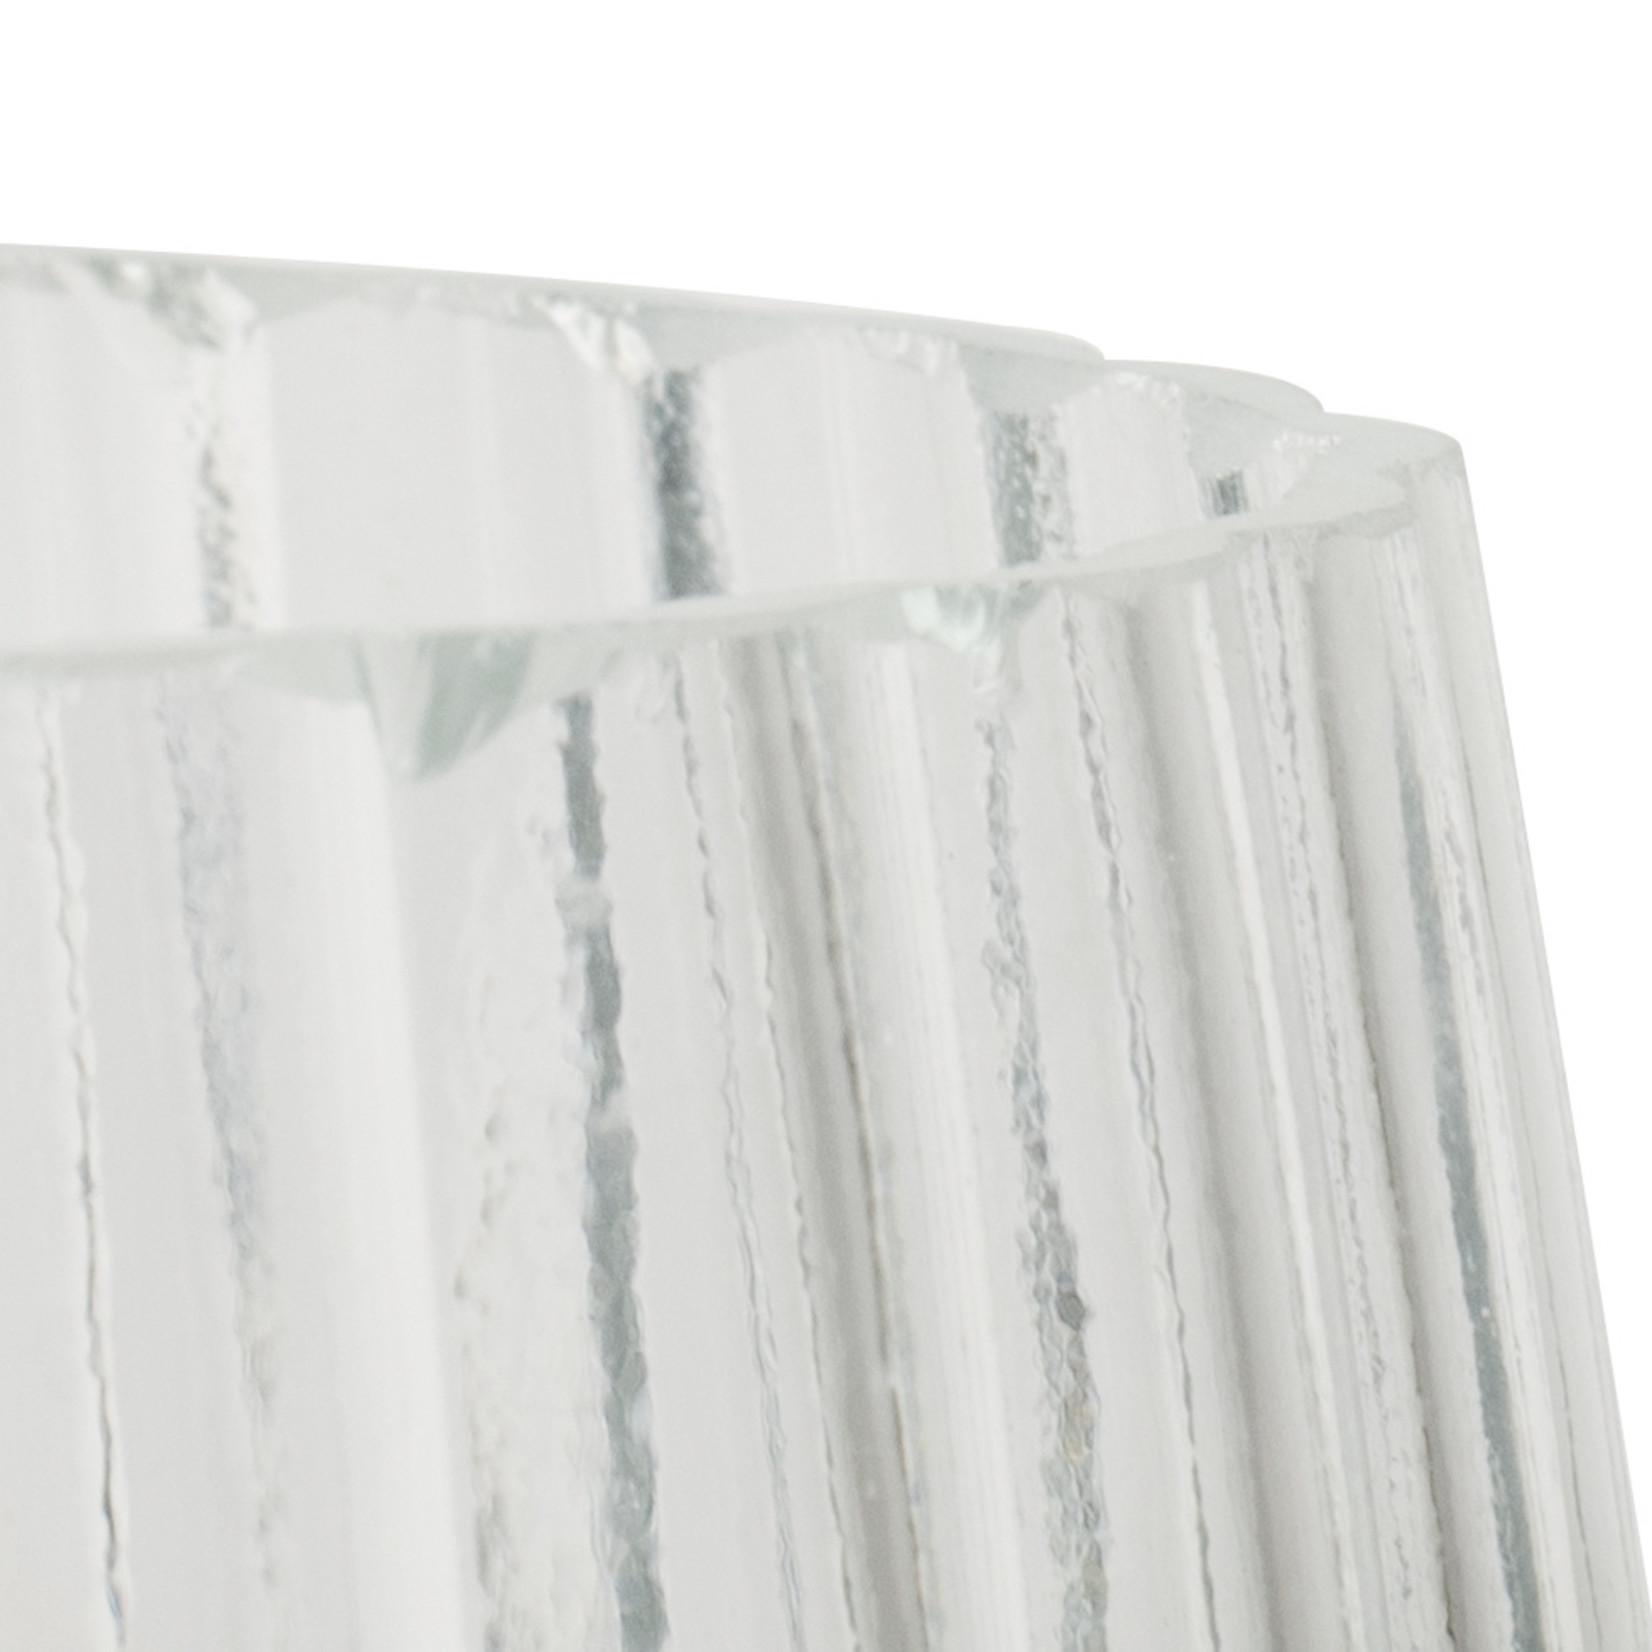 Jodeco Glass Design vaas 'Dex'